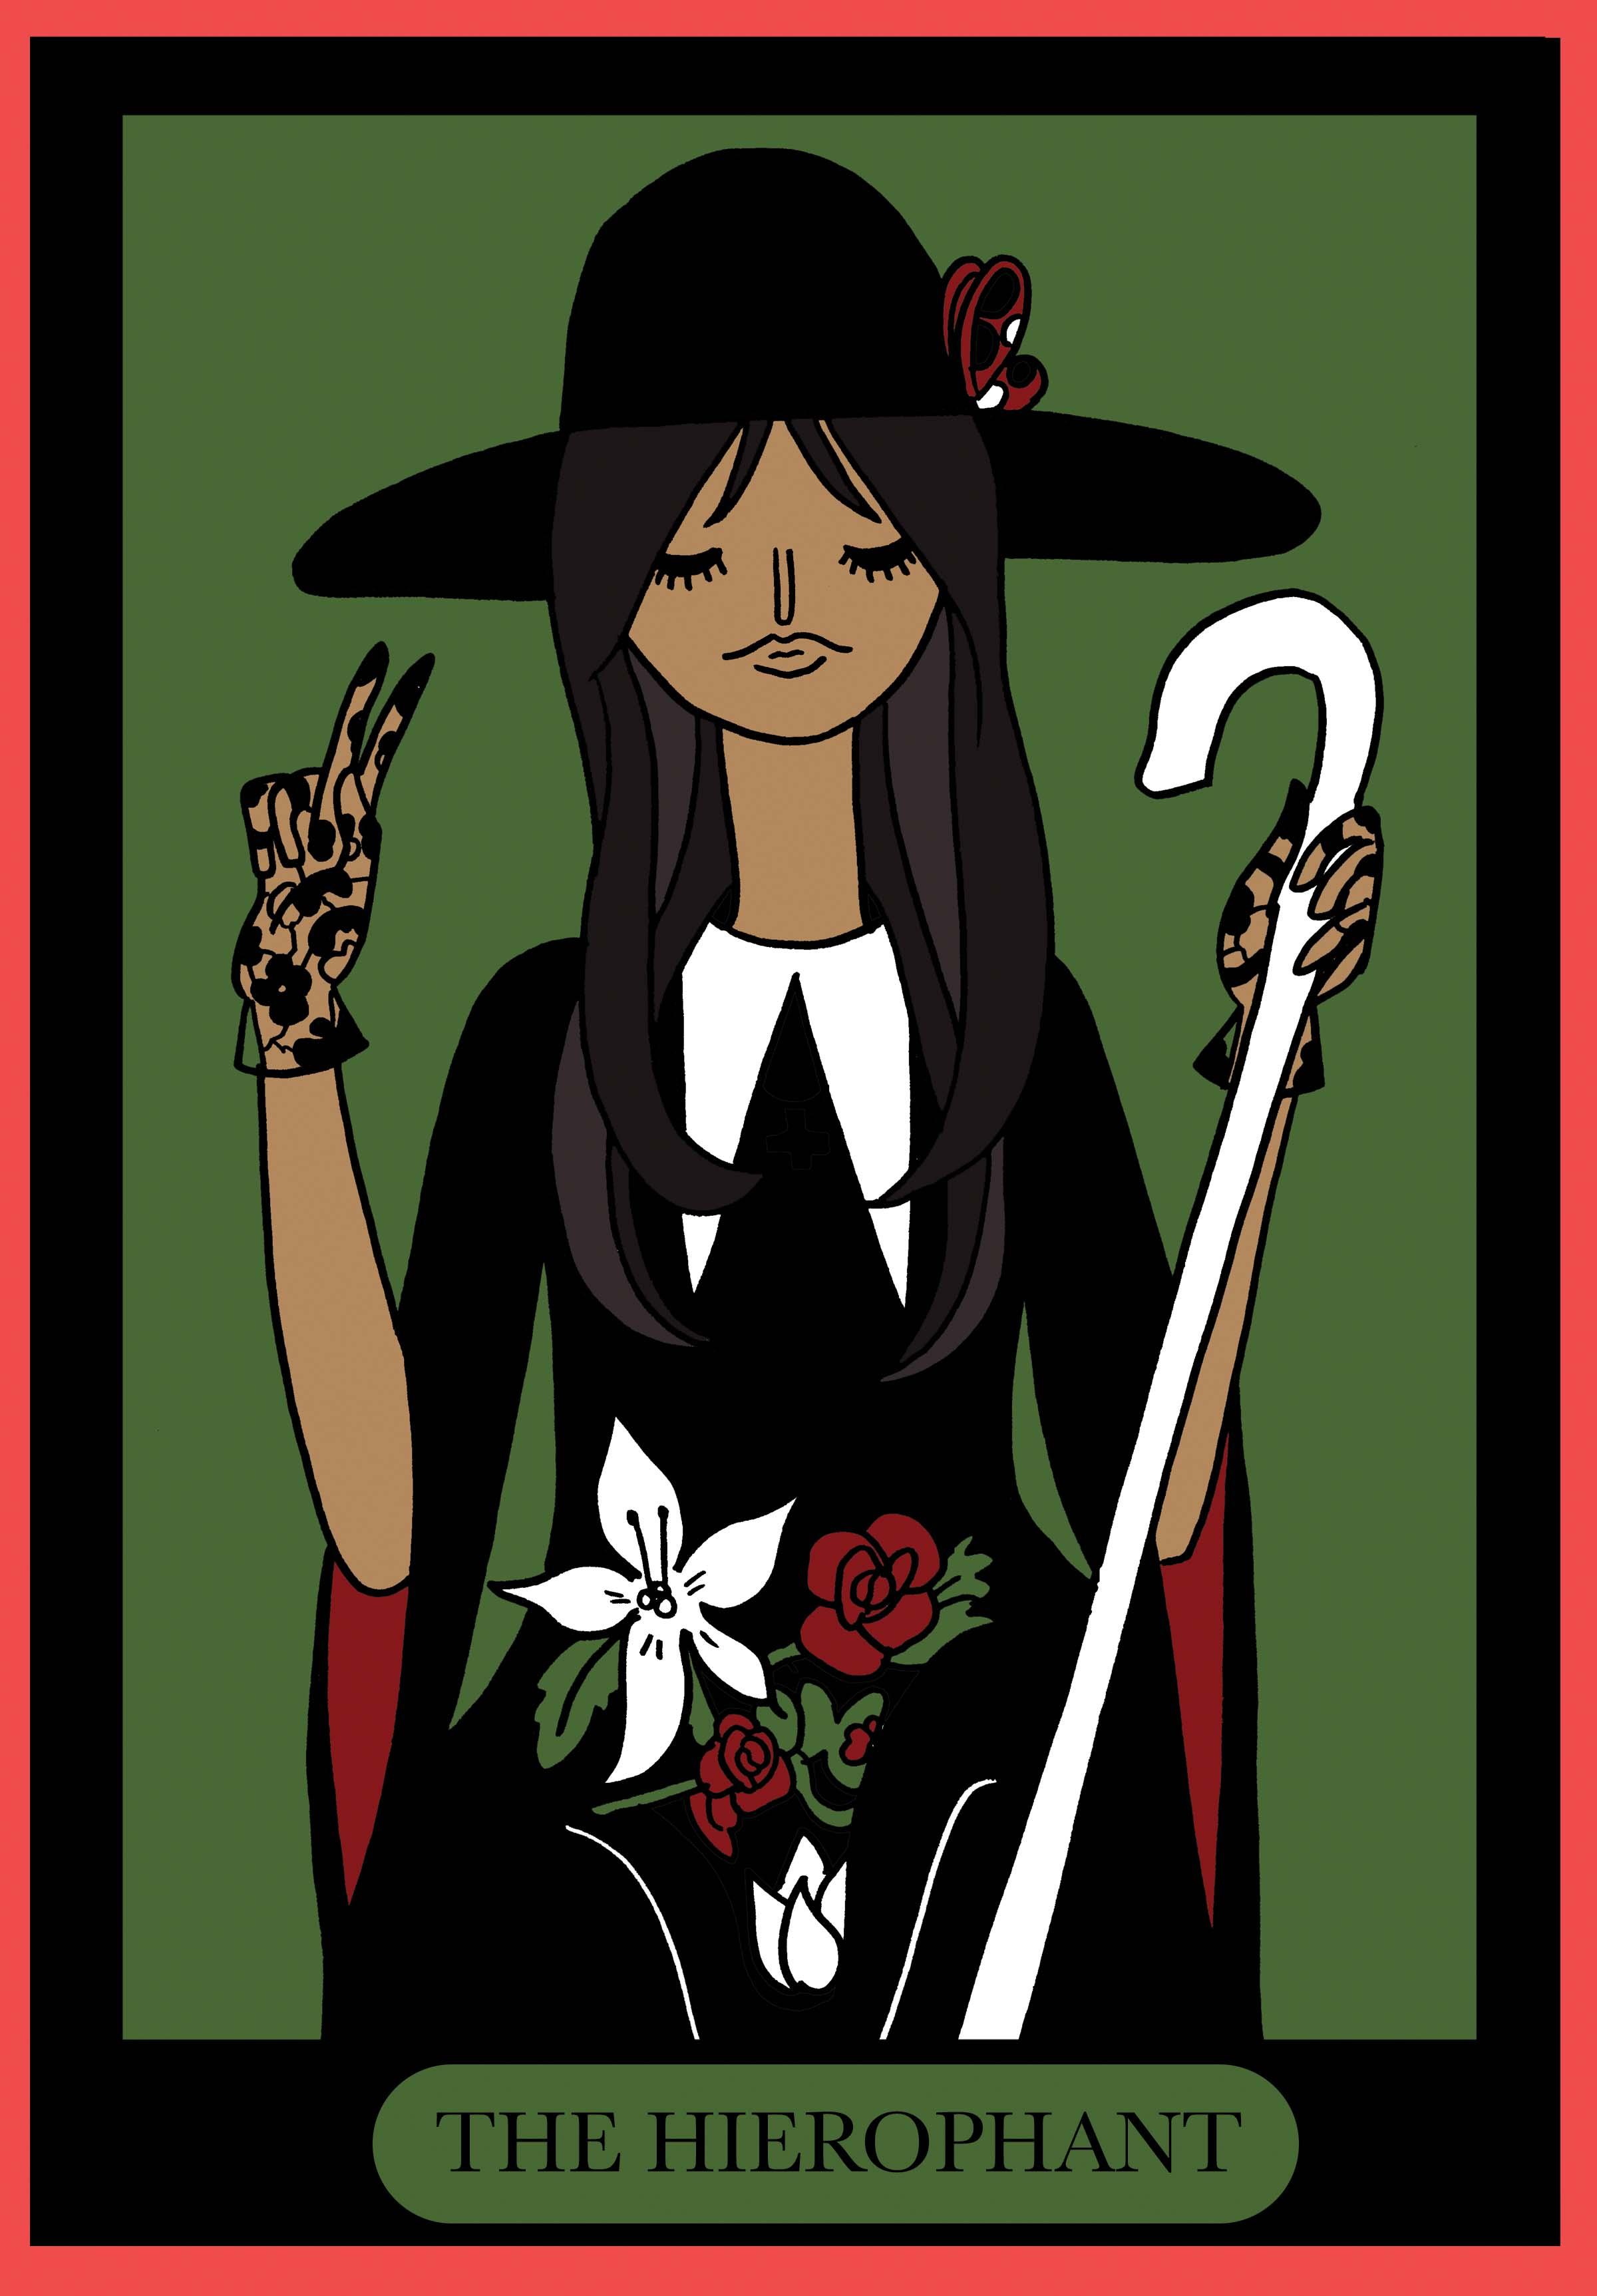 the-hierophant-card.jpg